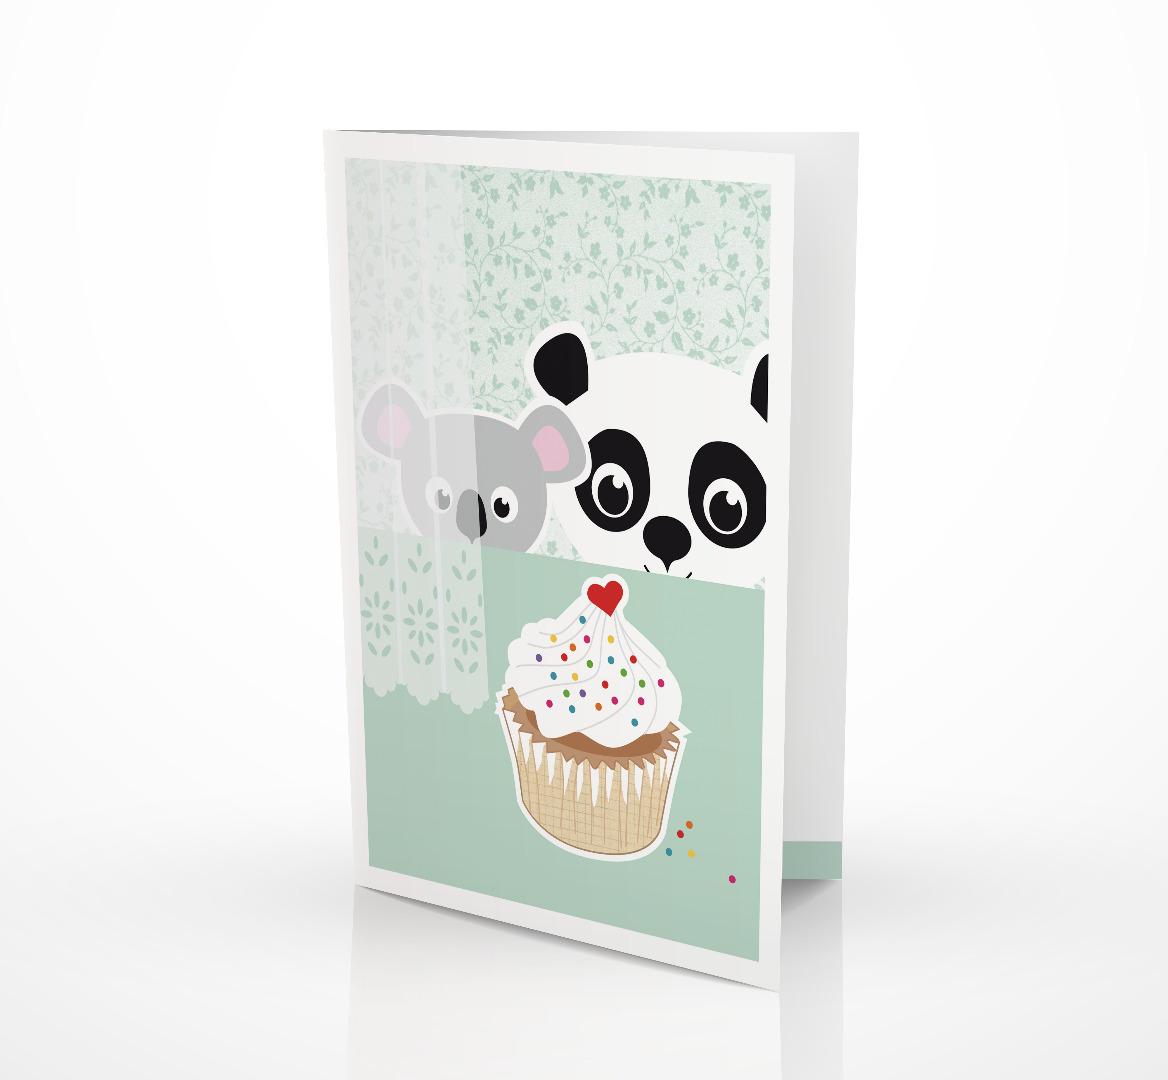 Grußkarte Panda & Koala Geburtstagskarte 2